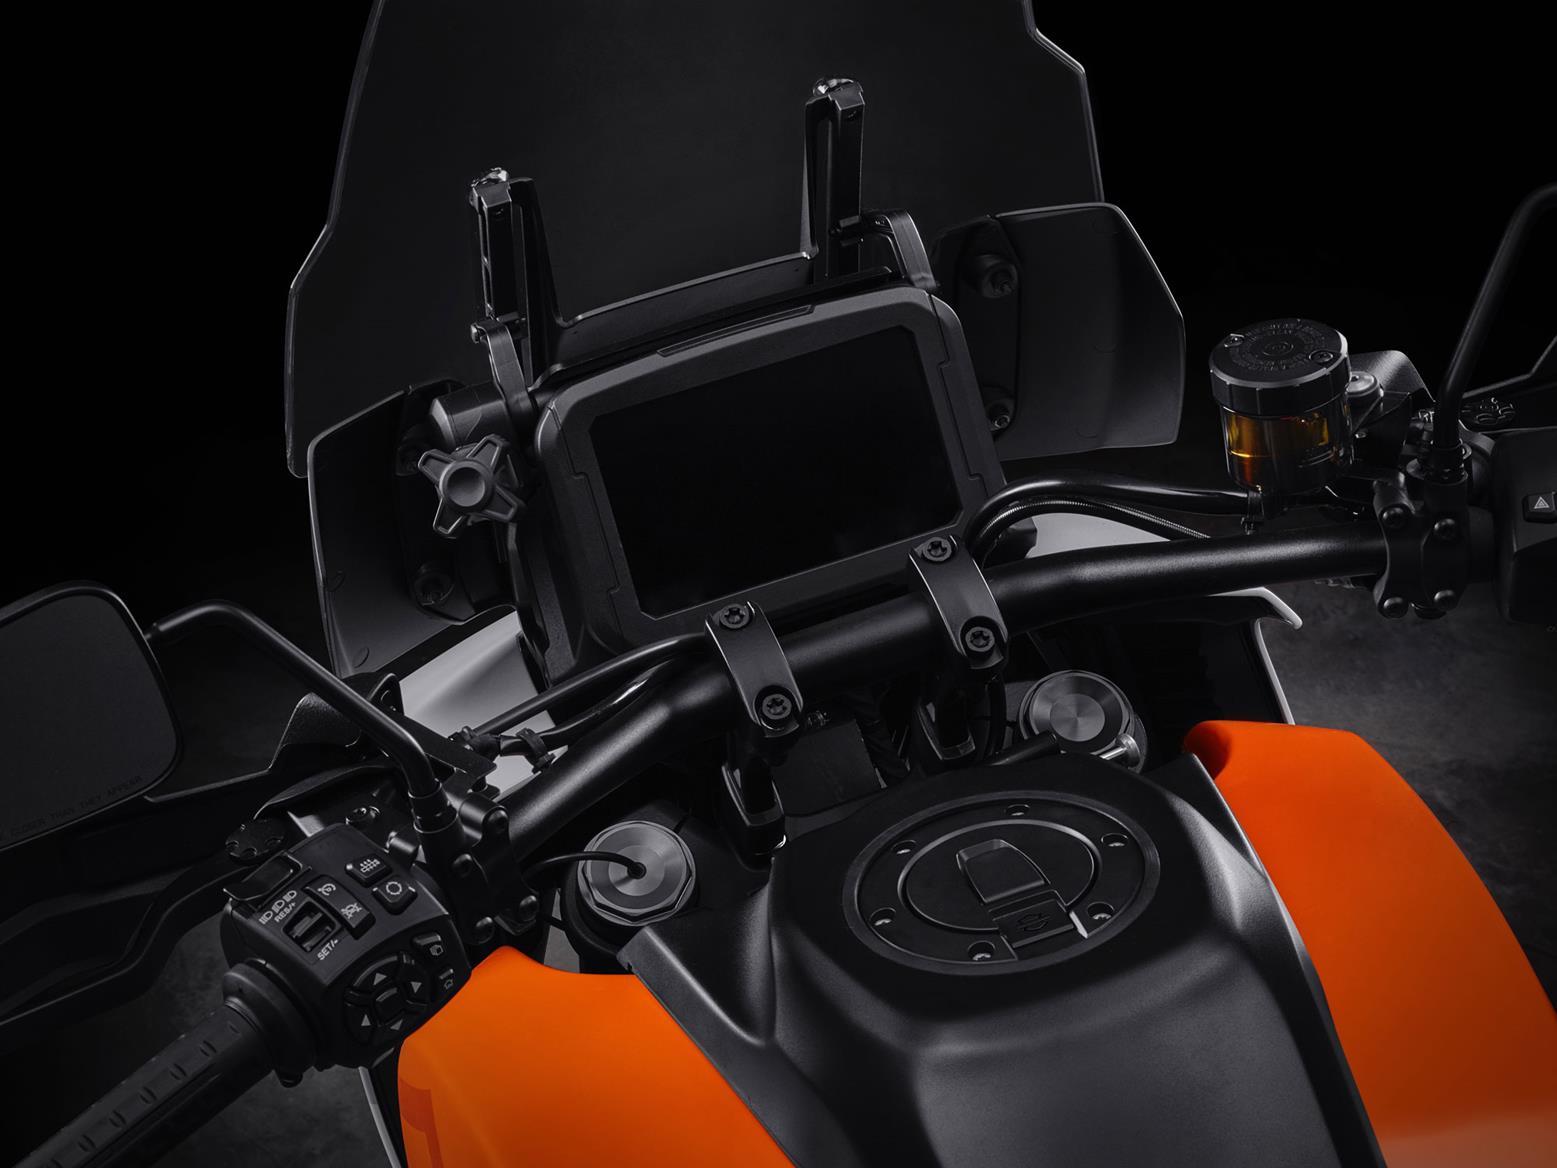 Harley-Davidson Pan America TFT screen